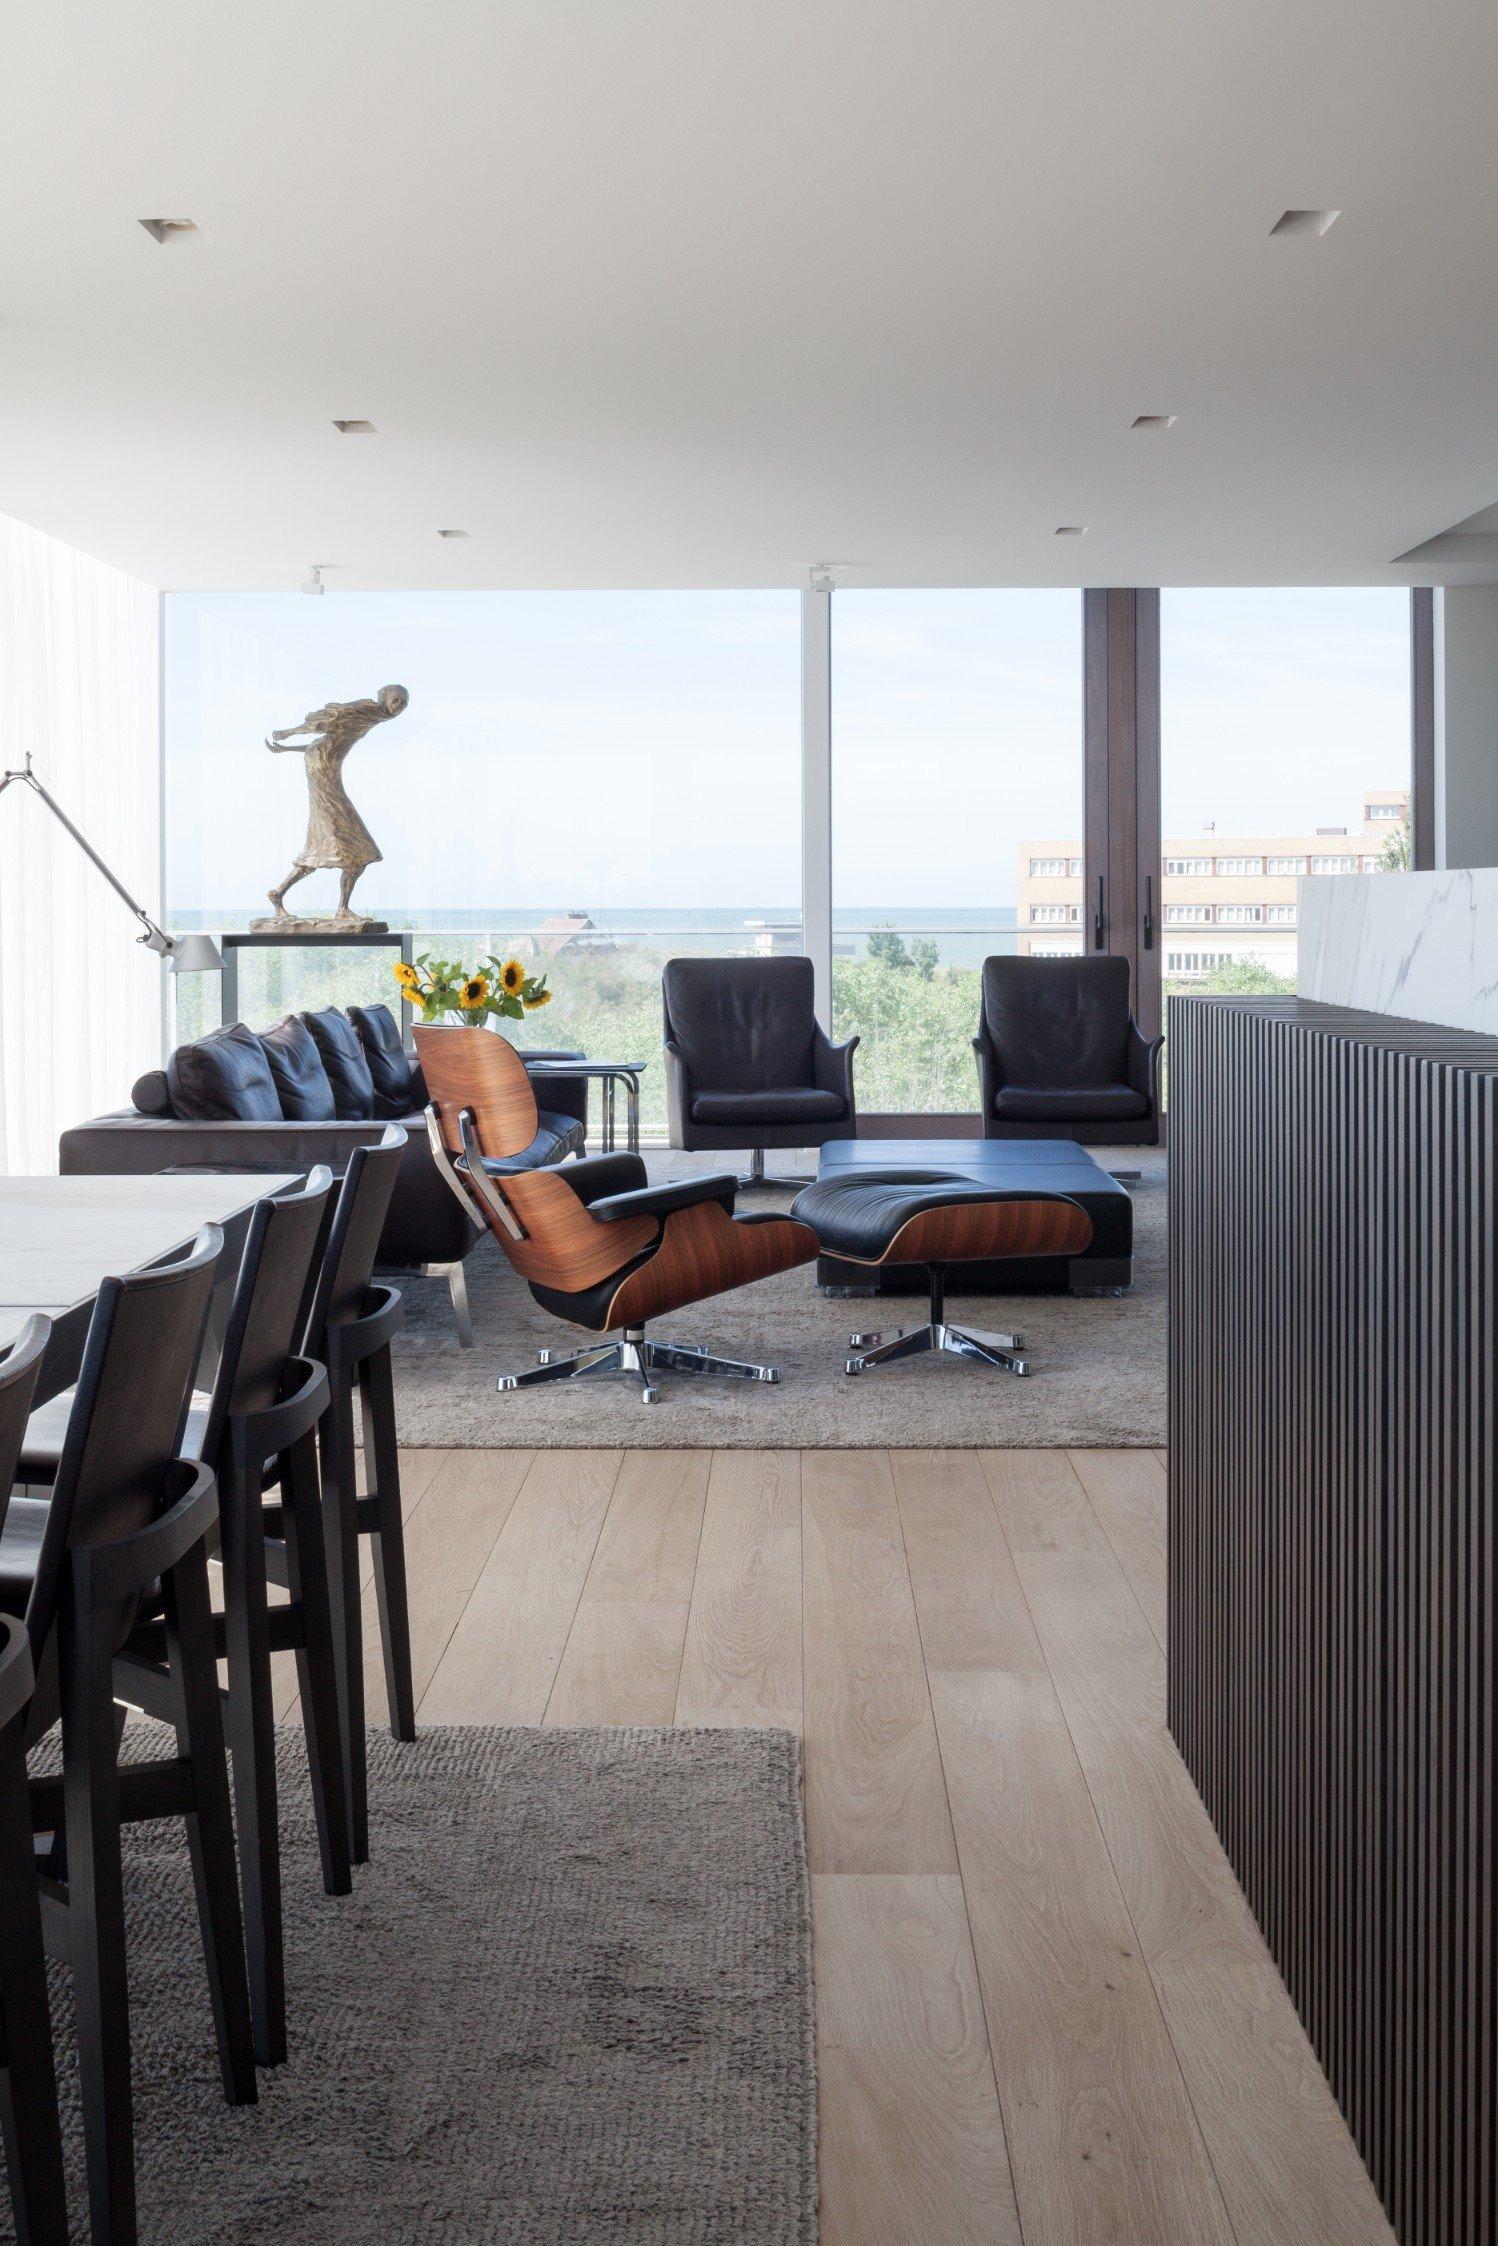 Rietveldprojects-penthouse-appartement-design-architectuur-kust39